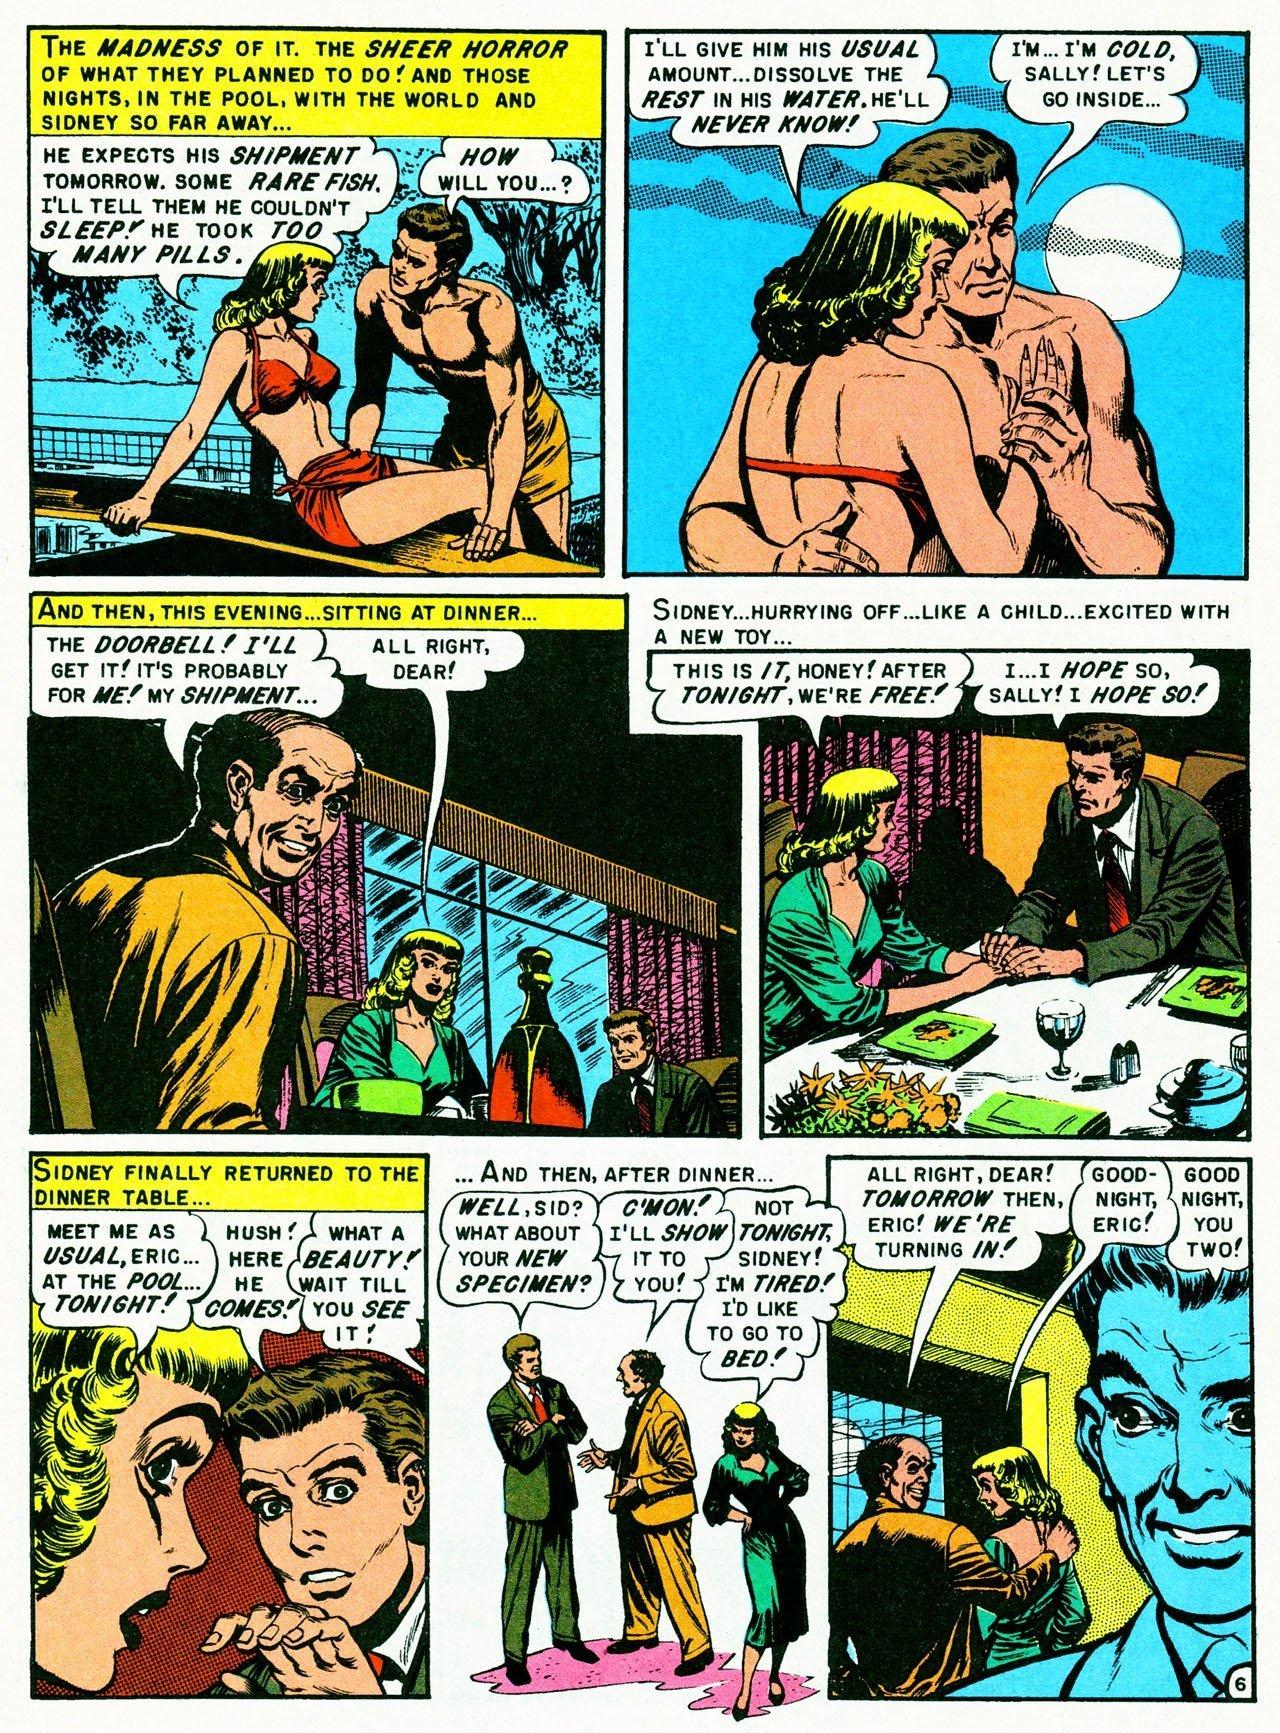 Read online Shock SuspenStories comic -  Issue #8 - 8